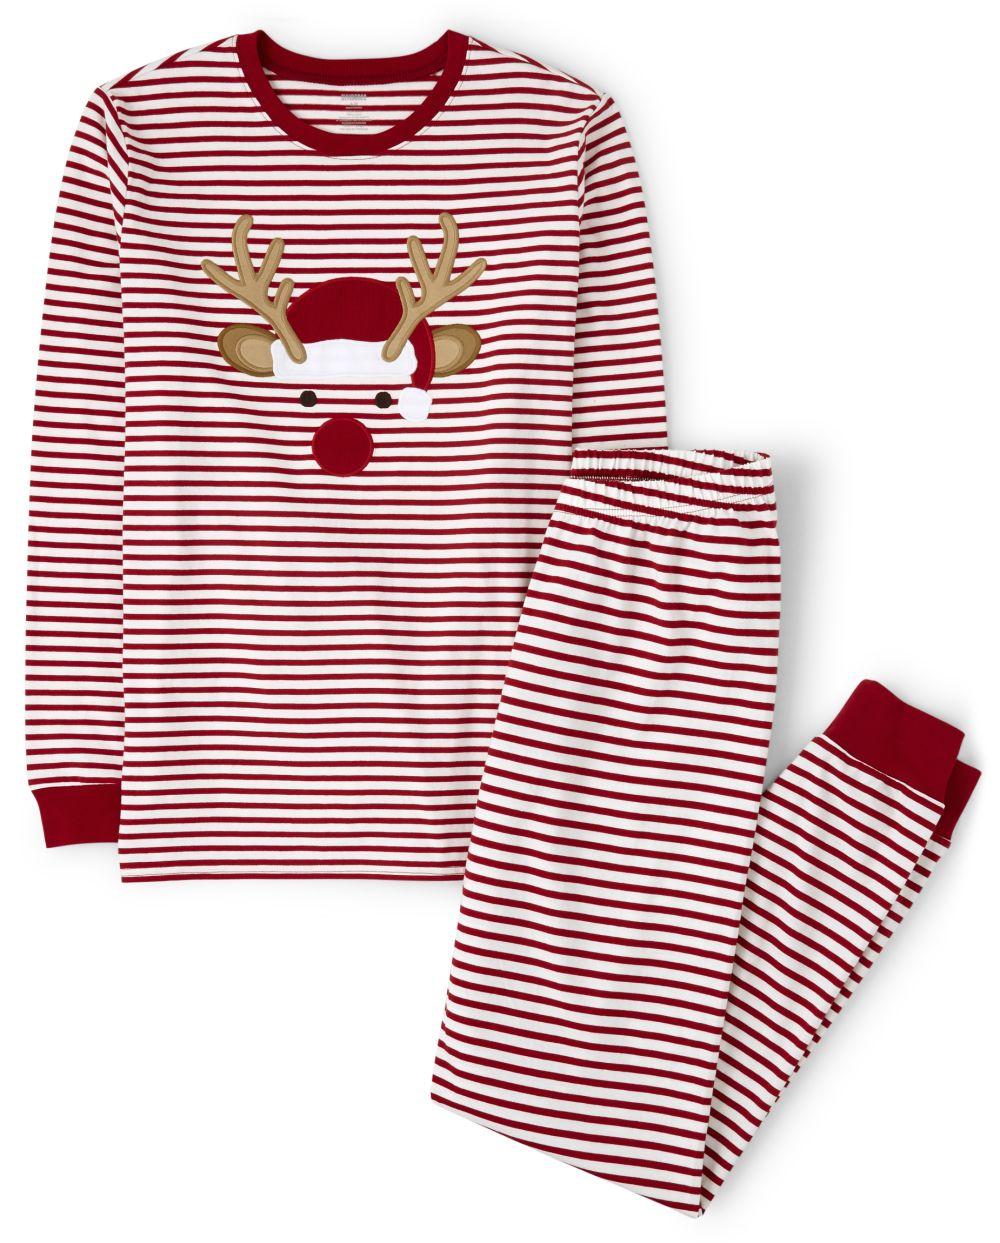 Unisex Adult Matching Family Reindeer Cotton 2-Piece Pajamas - Gymmies